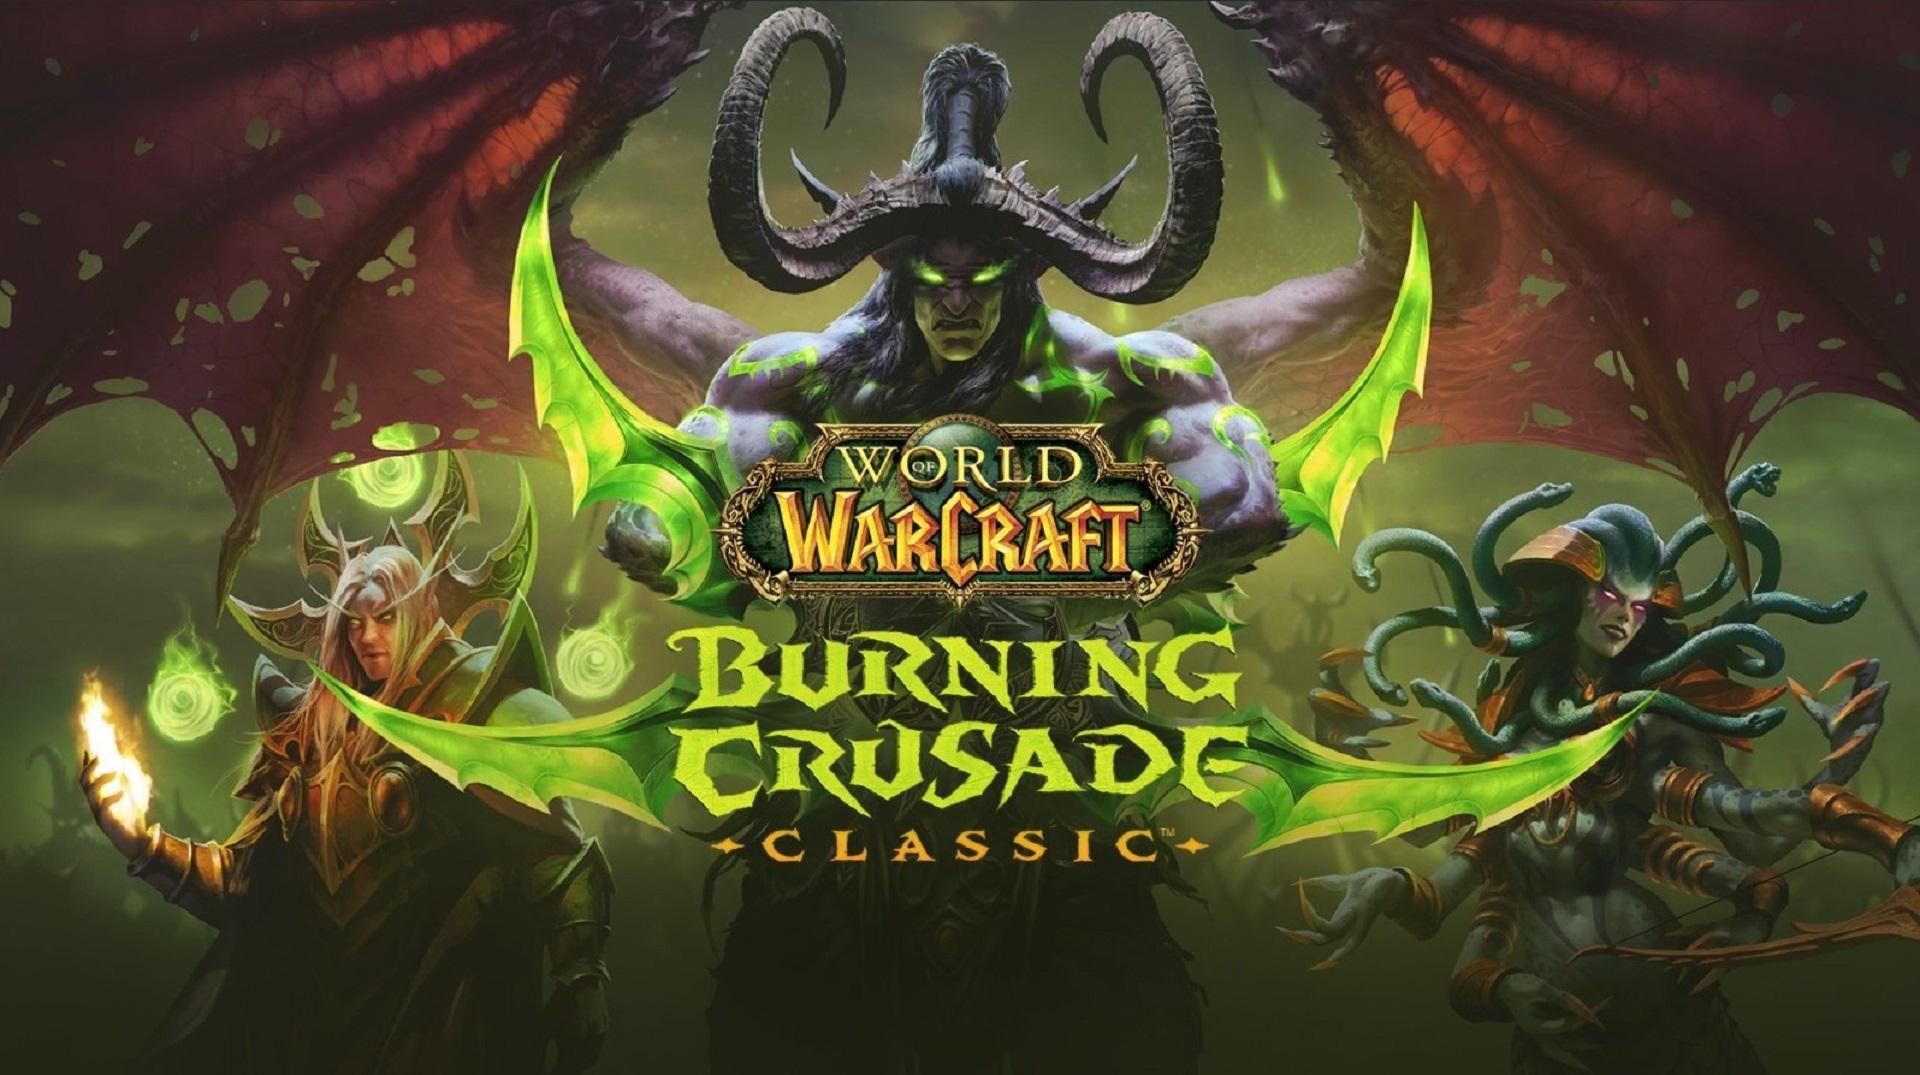 world of warcraft the burning crusade classic